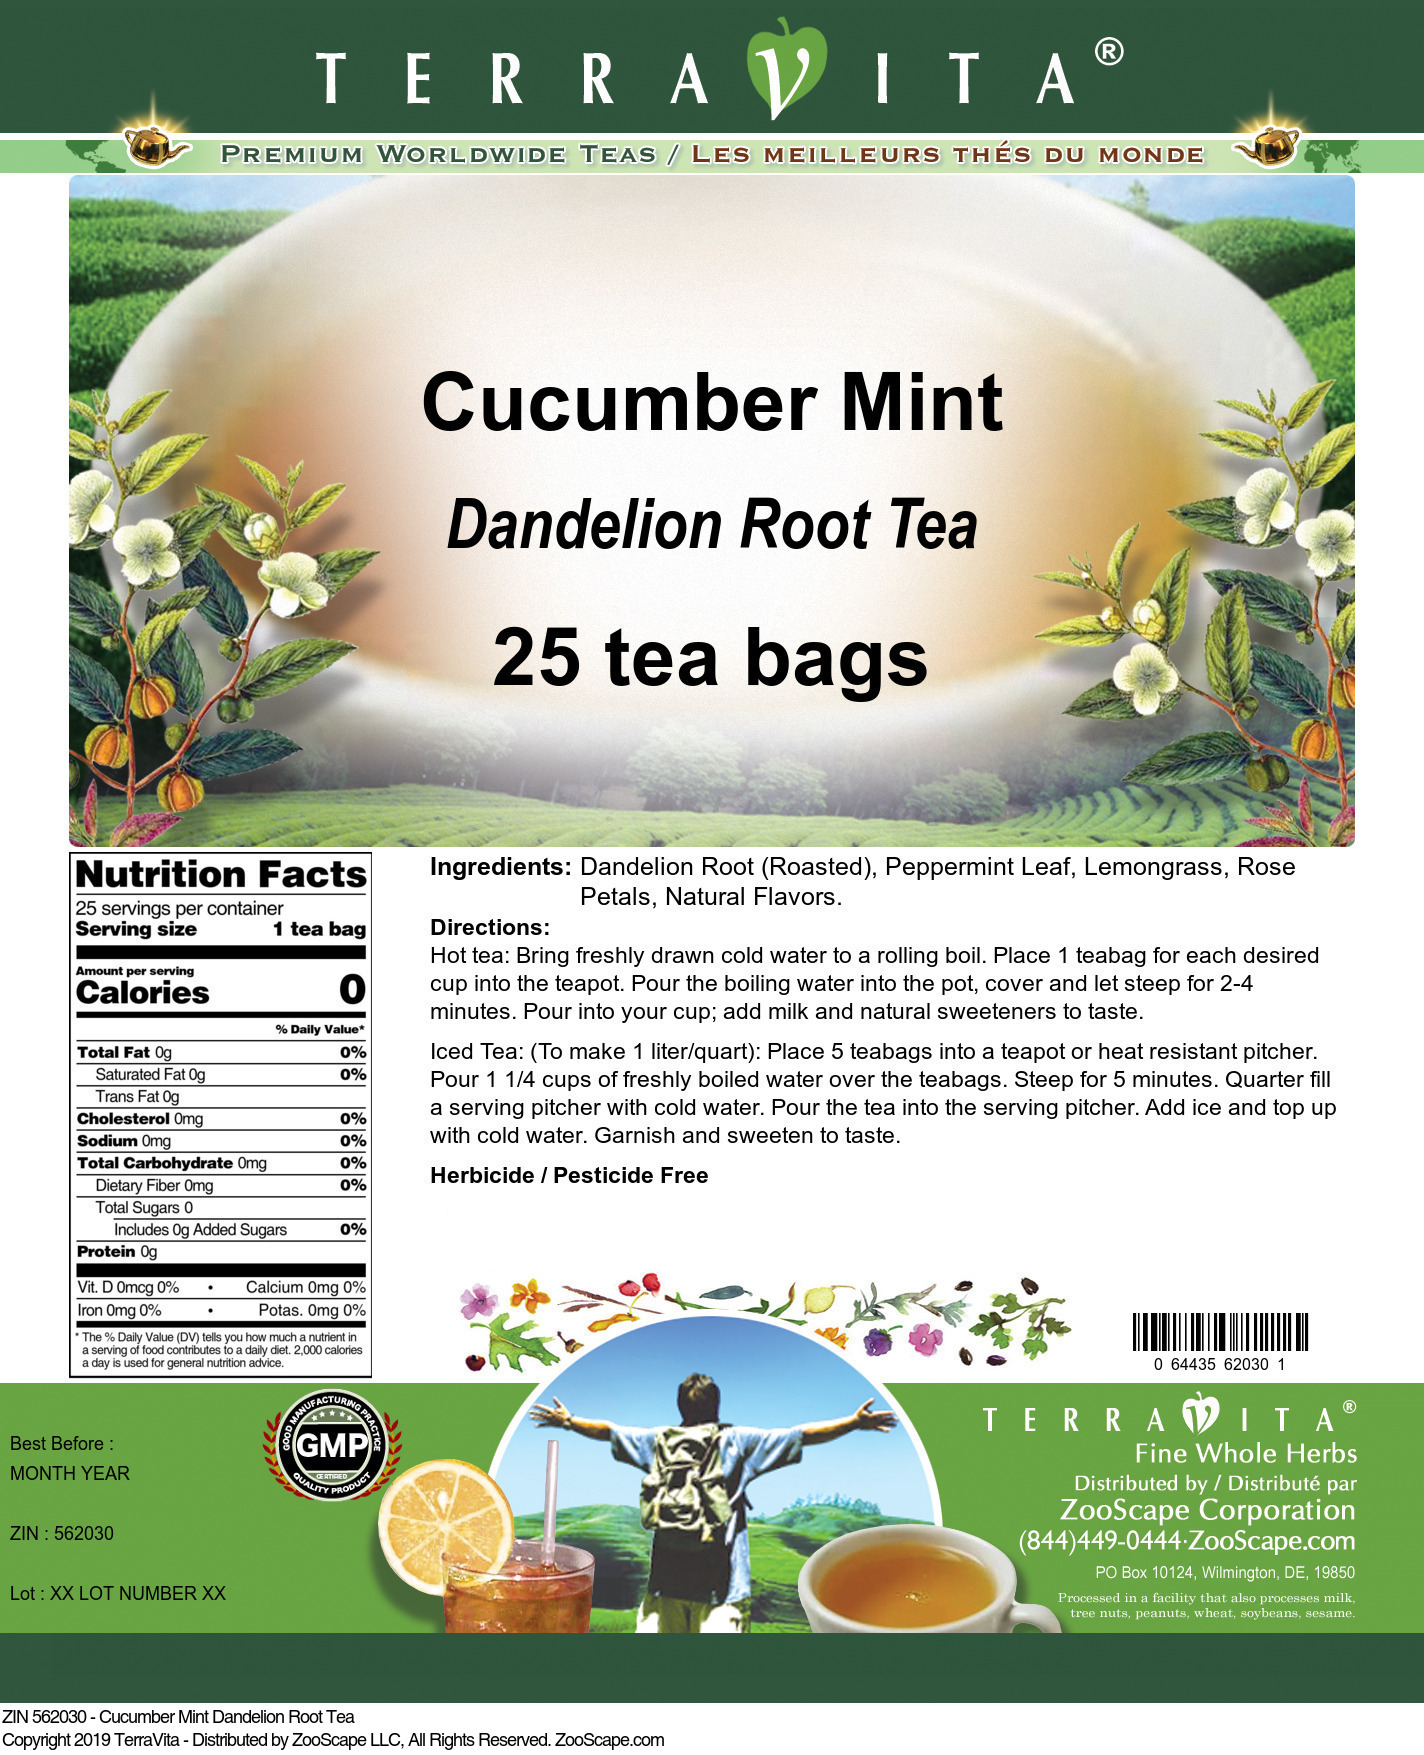 Cucumber Mint Dandelion Root